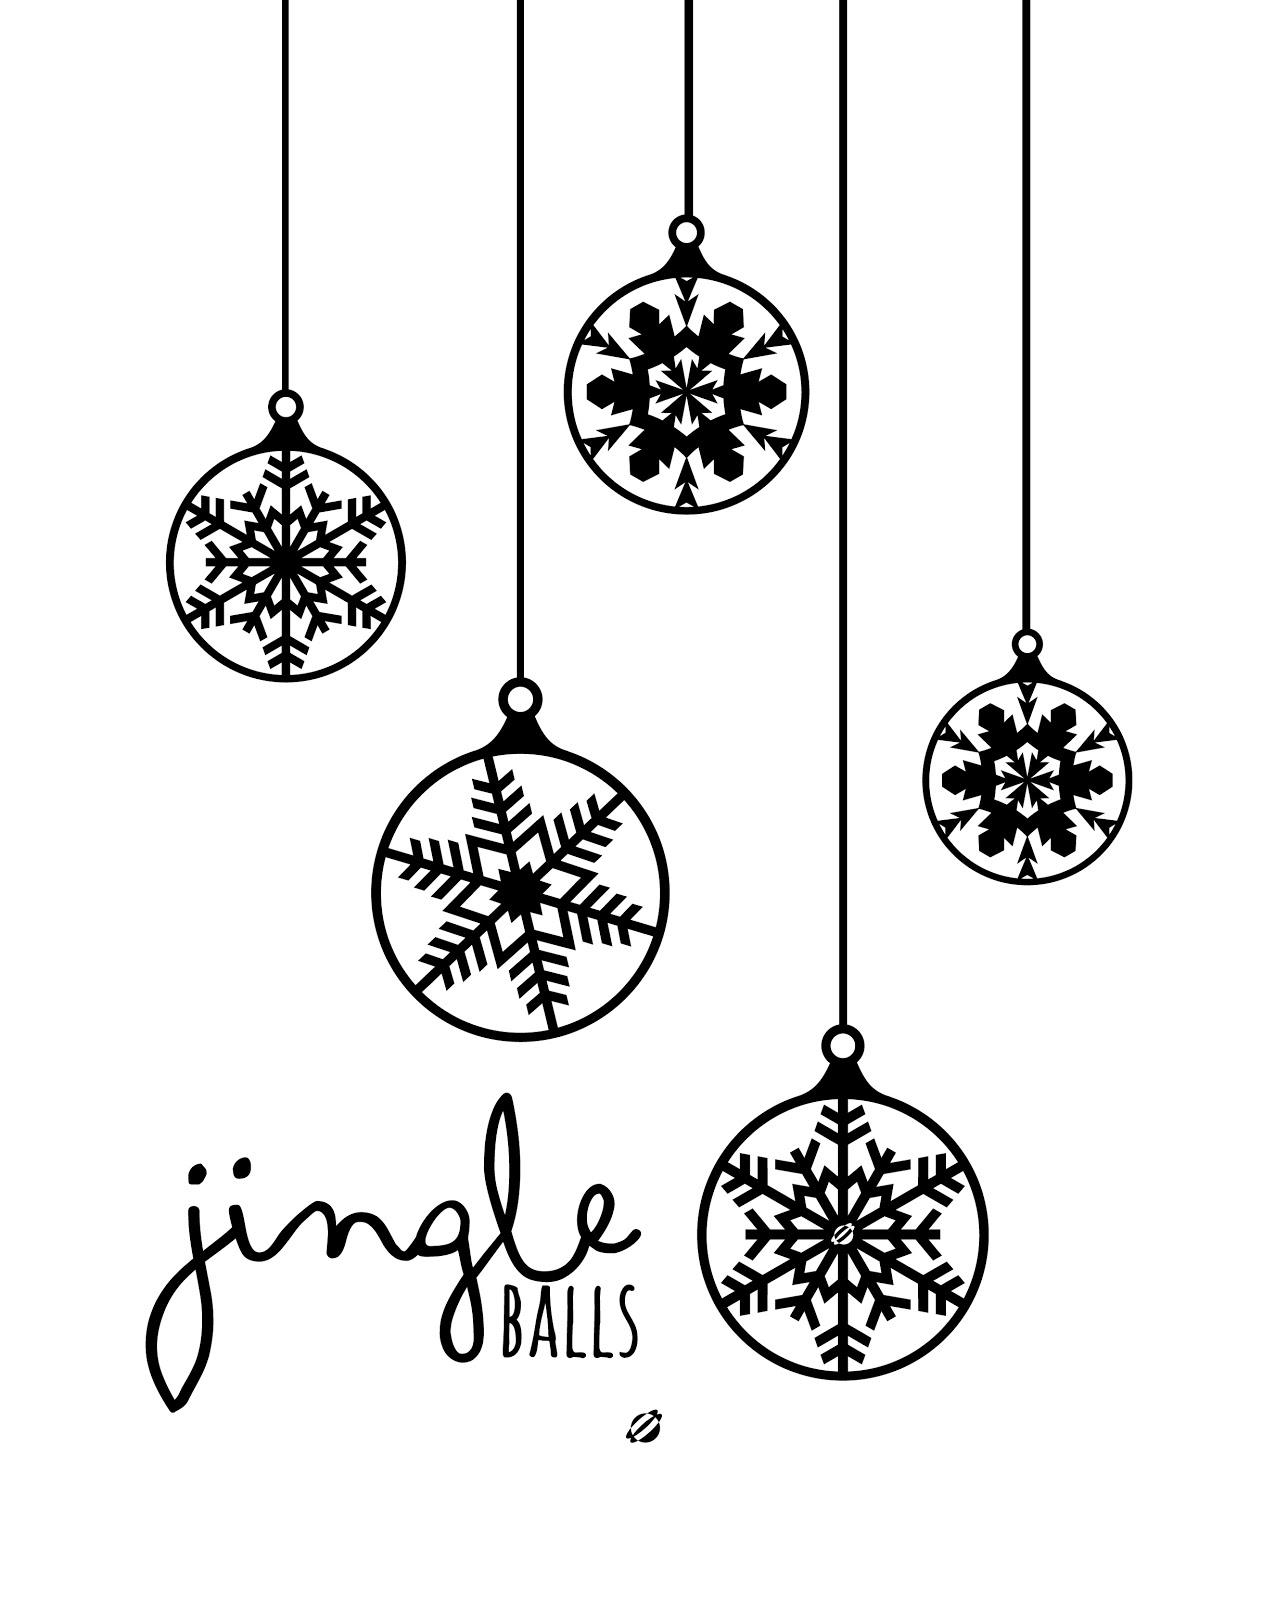 1288x1600 Lostbumblebee Jingle Balls. A Cheeky Little Christmas Print.